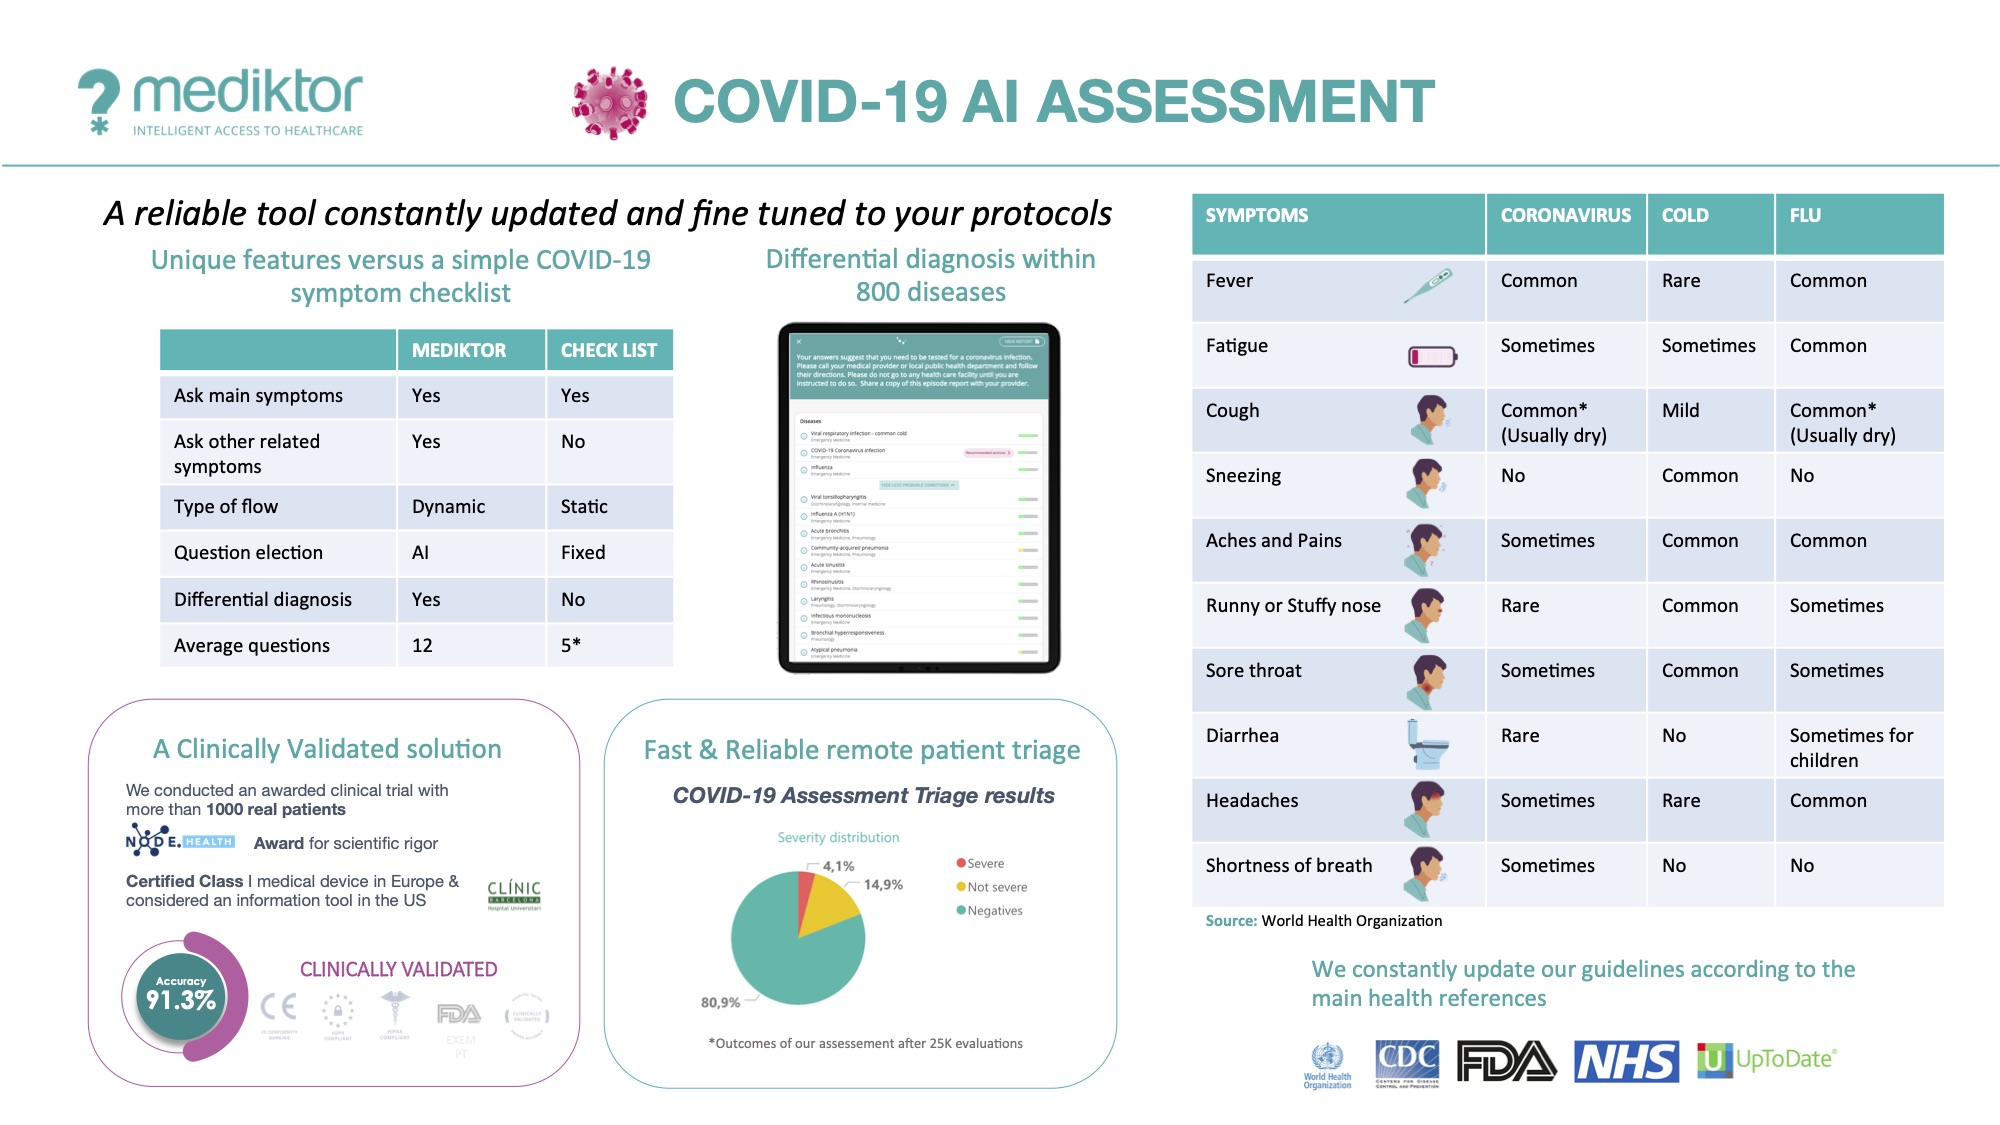 Photo of digital health startup Mediktor and its Covid-19 Risk Assessment